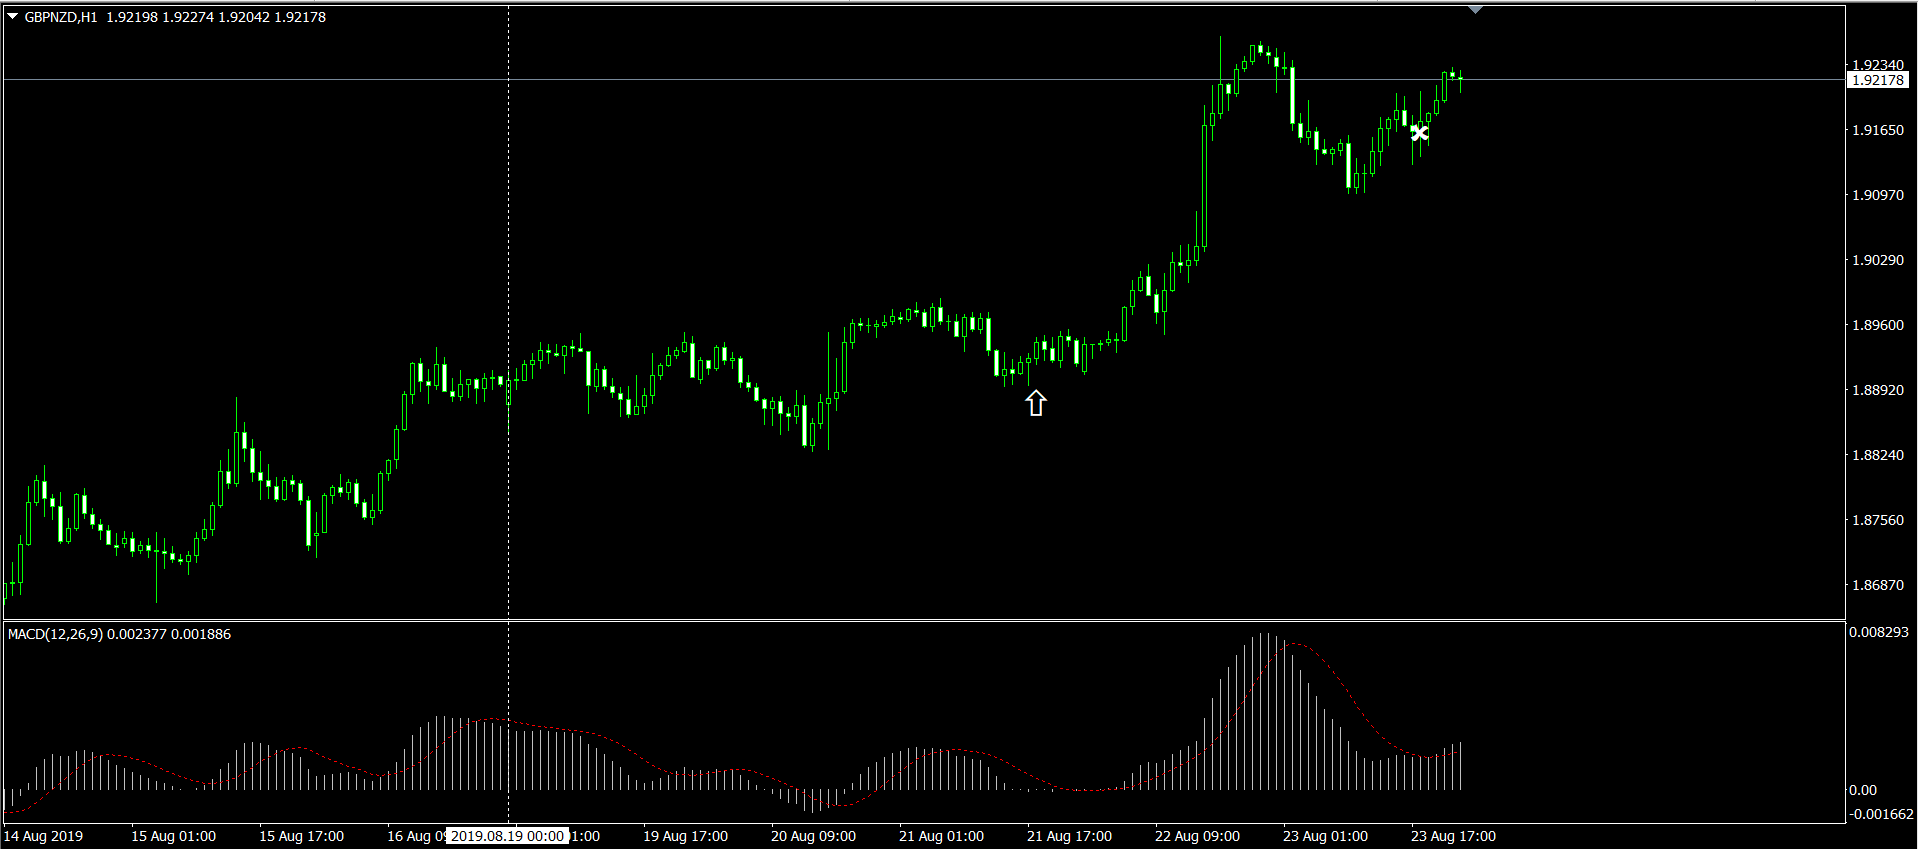 GBPNZD H1 チャート画面